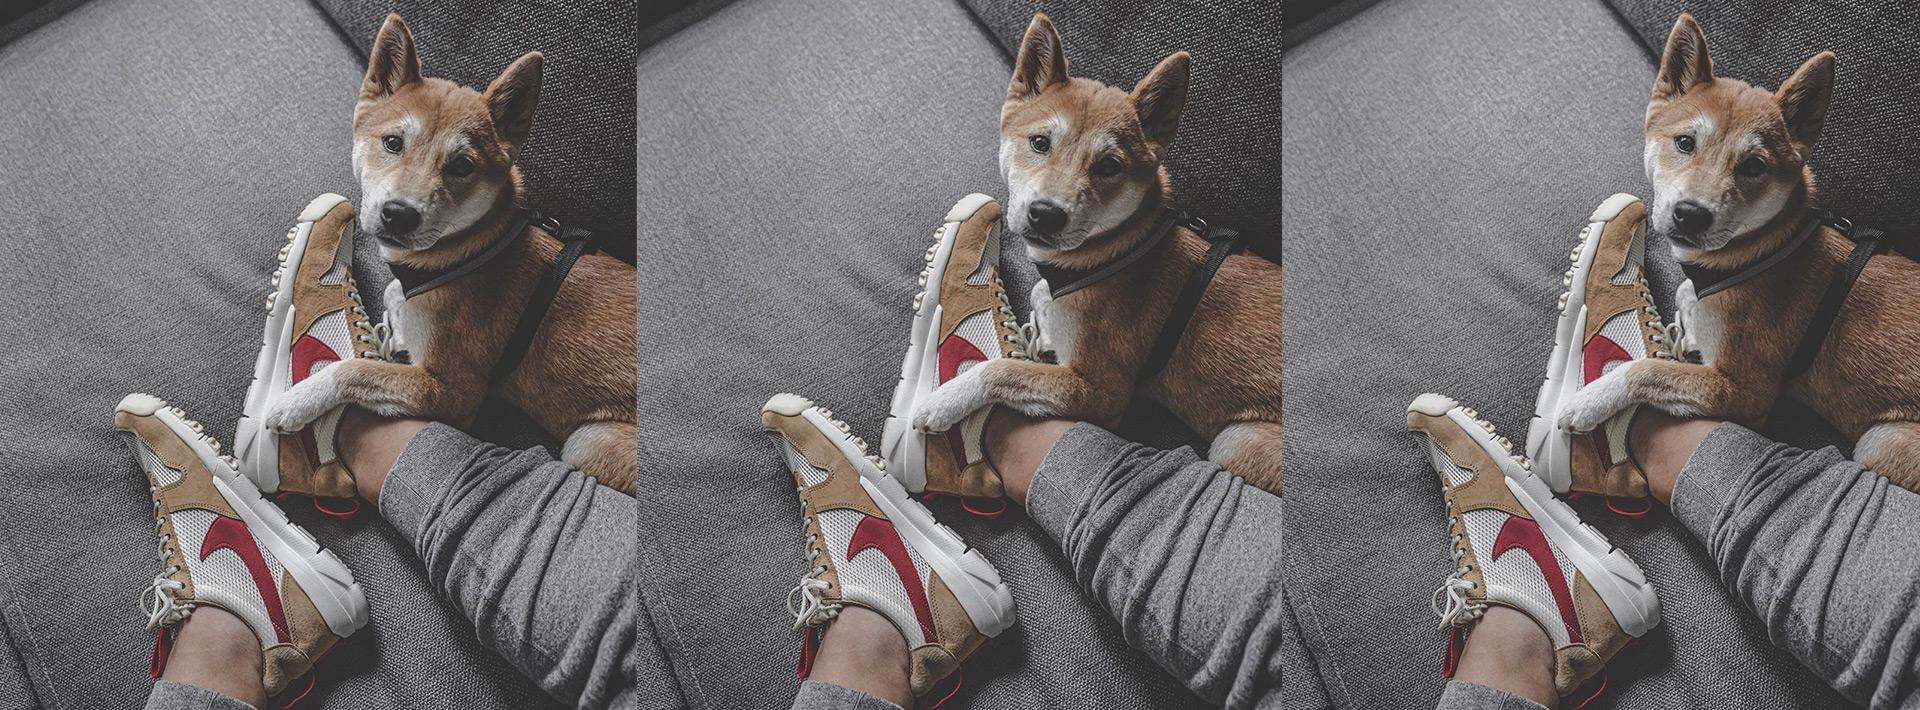 TOM SACHS X NIKE MARS YARD 2.0 may be releasing Spring 2020 again nd sneakerheads be drippin.